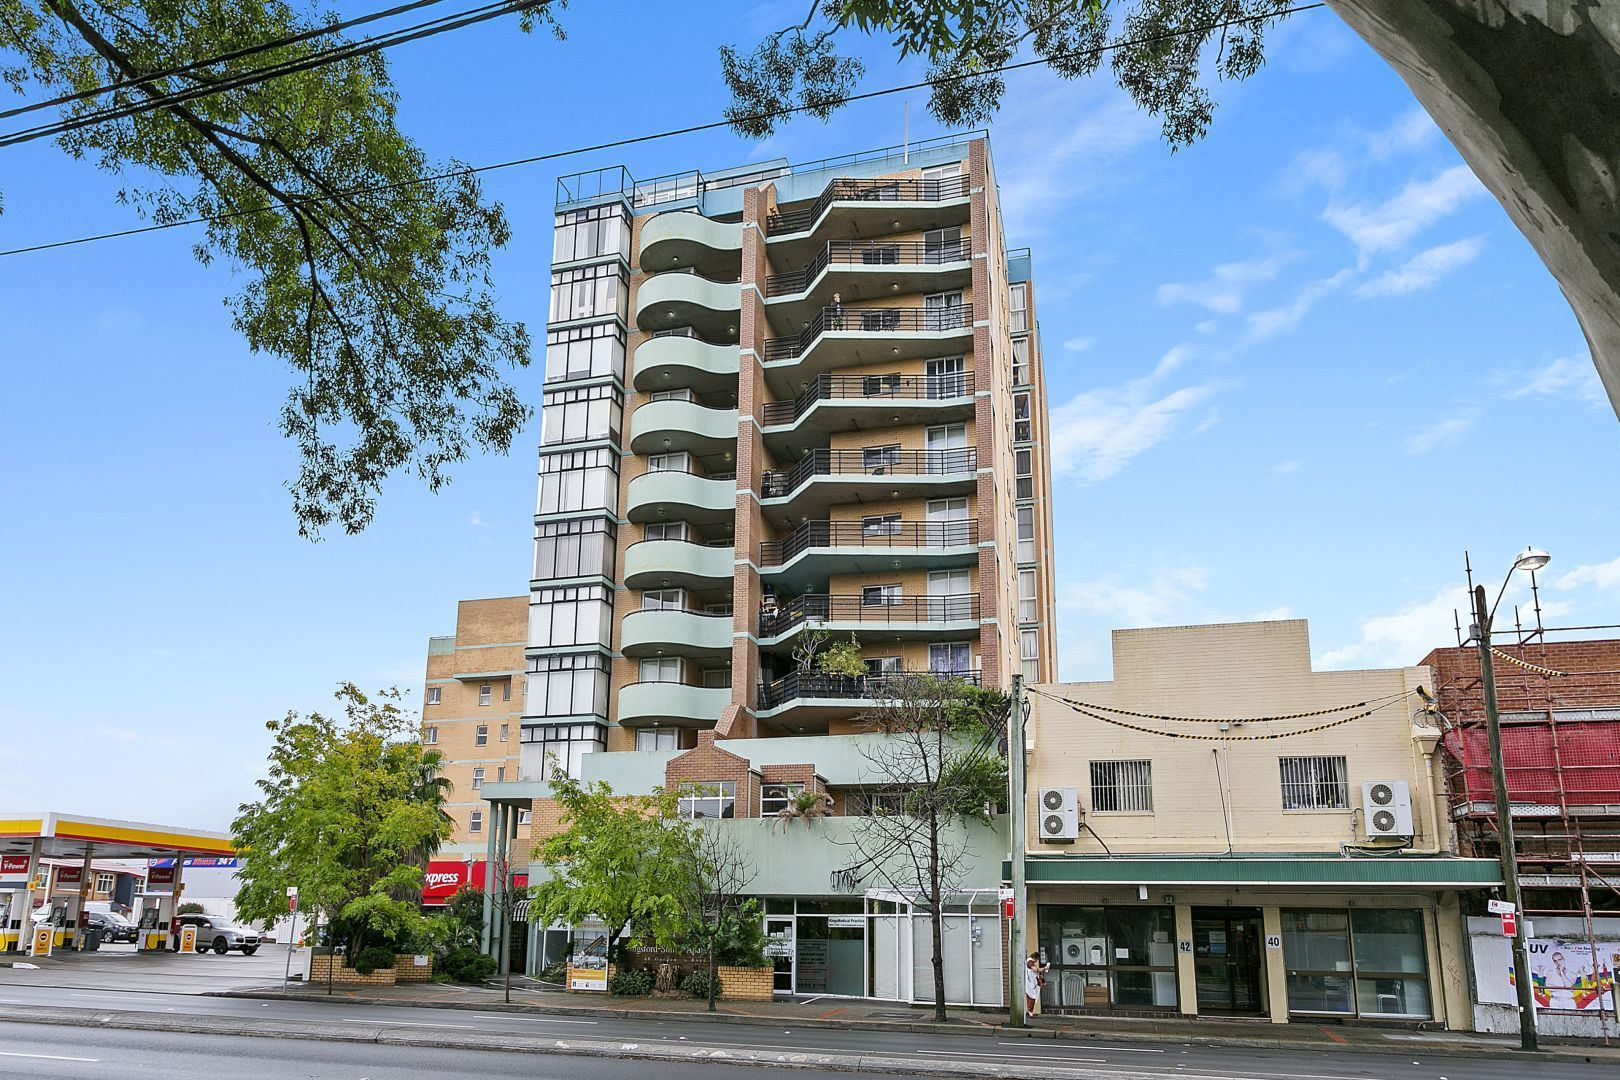 7/44-50 Gardeners Road, Kingsford NSW 2032, Image 0